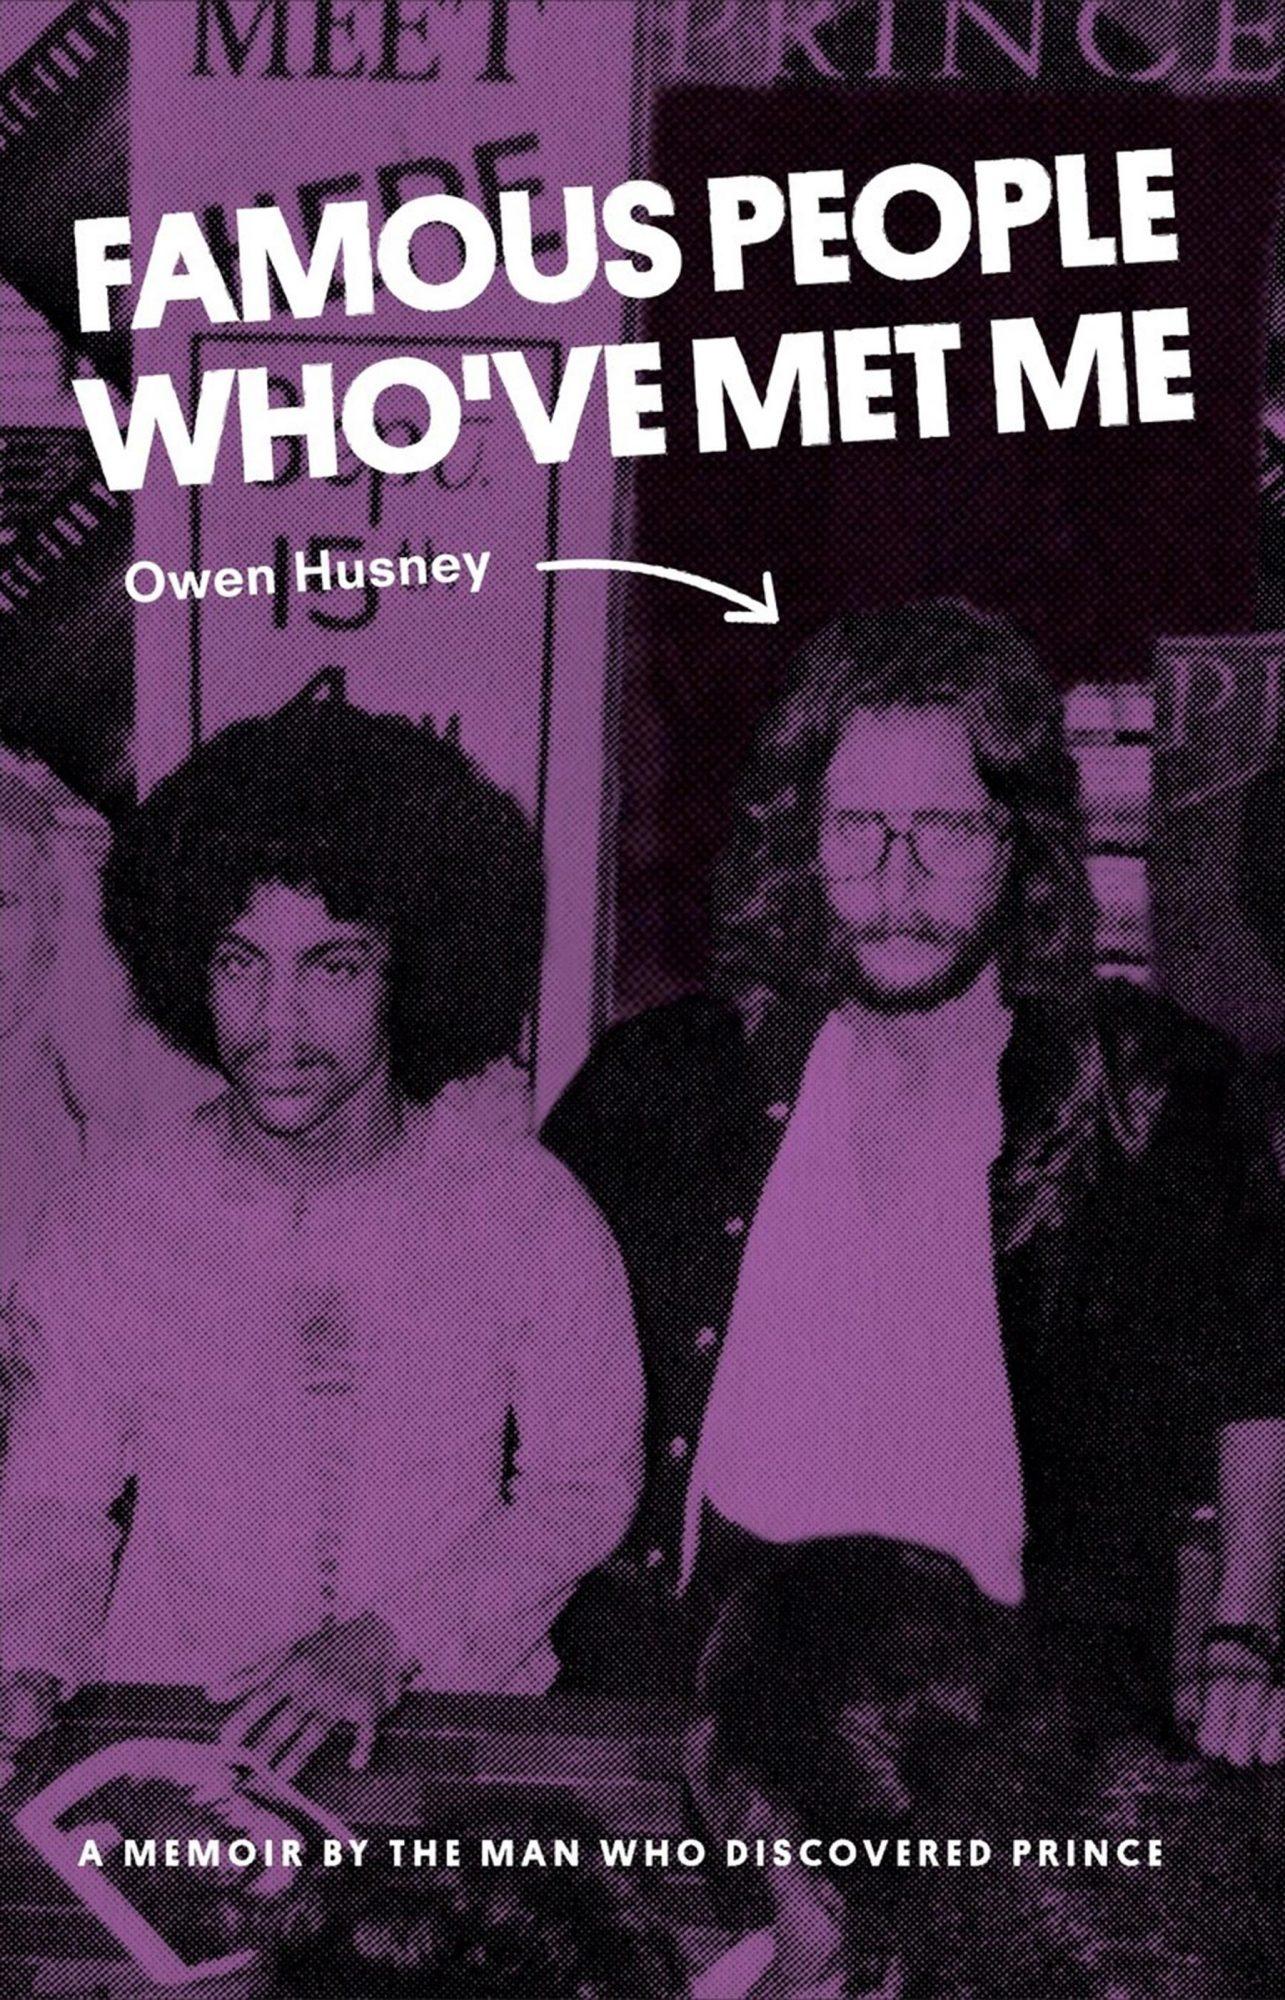 Prince-book